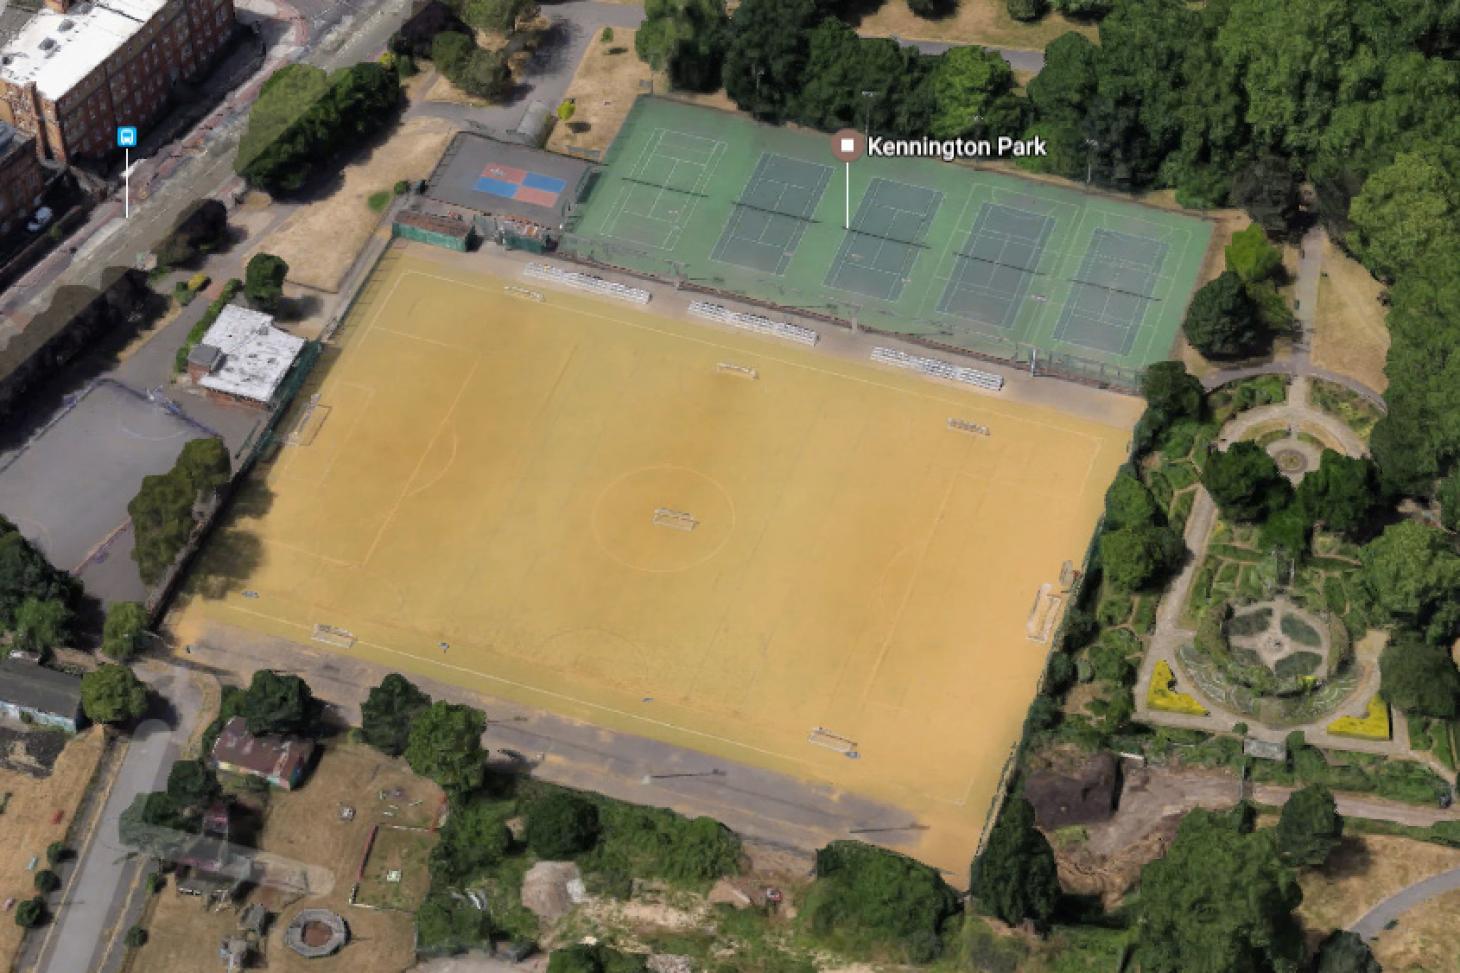 Kennington Park 5 a side   Astroturf football pitch